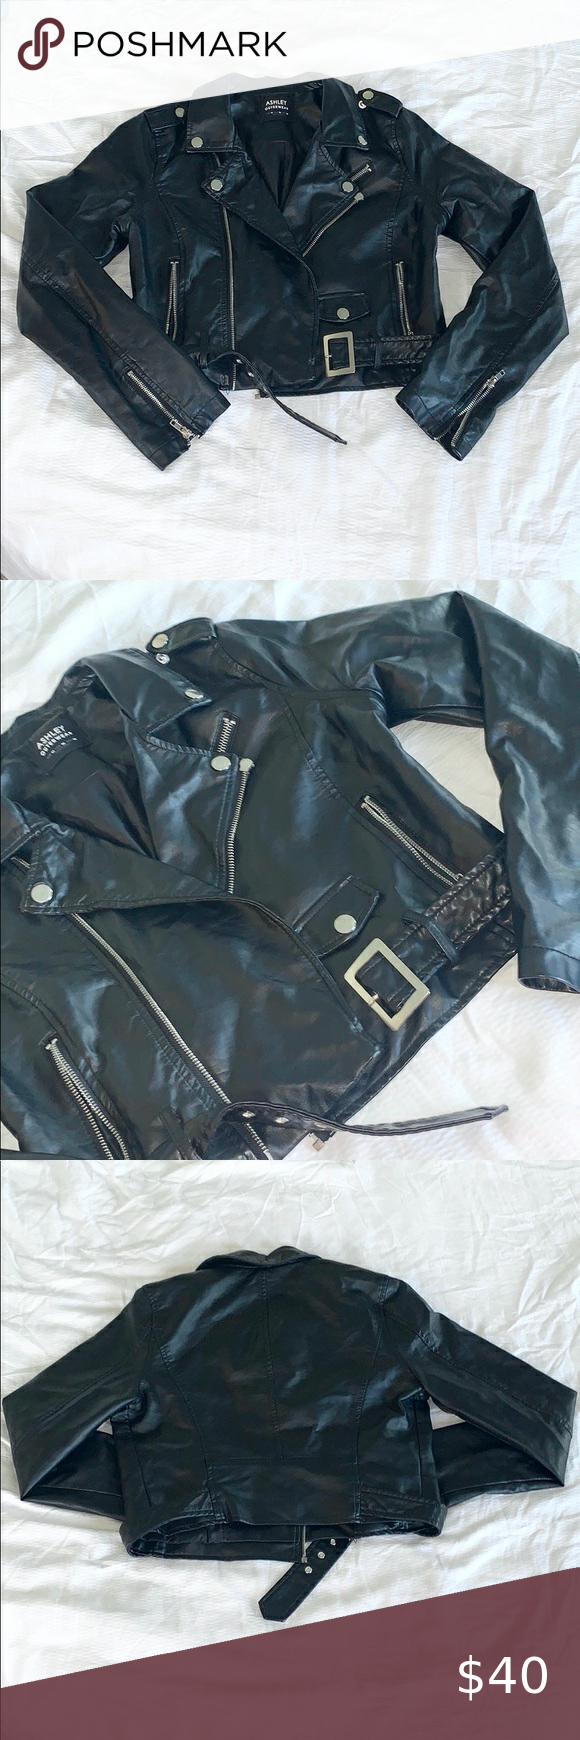 Ashley Outerwear Black Leather Jacket Leather Jacket Black Leather Jacket Black Leather [ 1740 x 580 Pixel ]